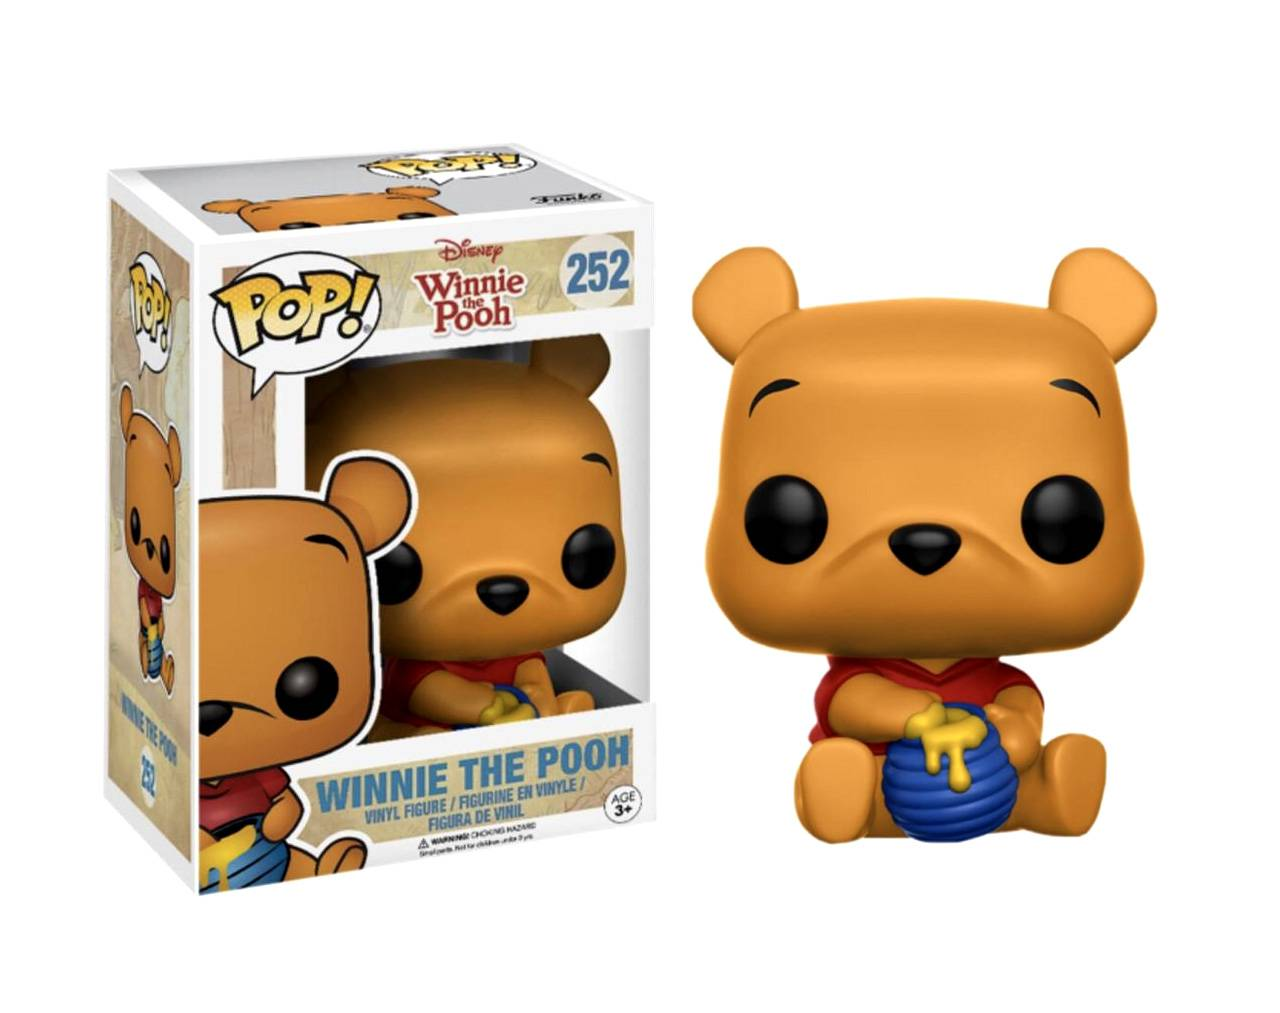 Winnie The Pooh Pop! Vinyl